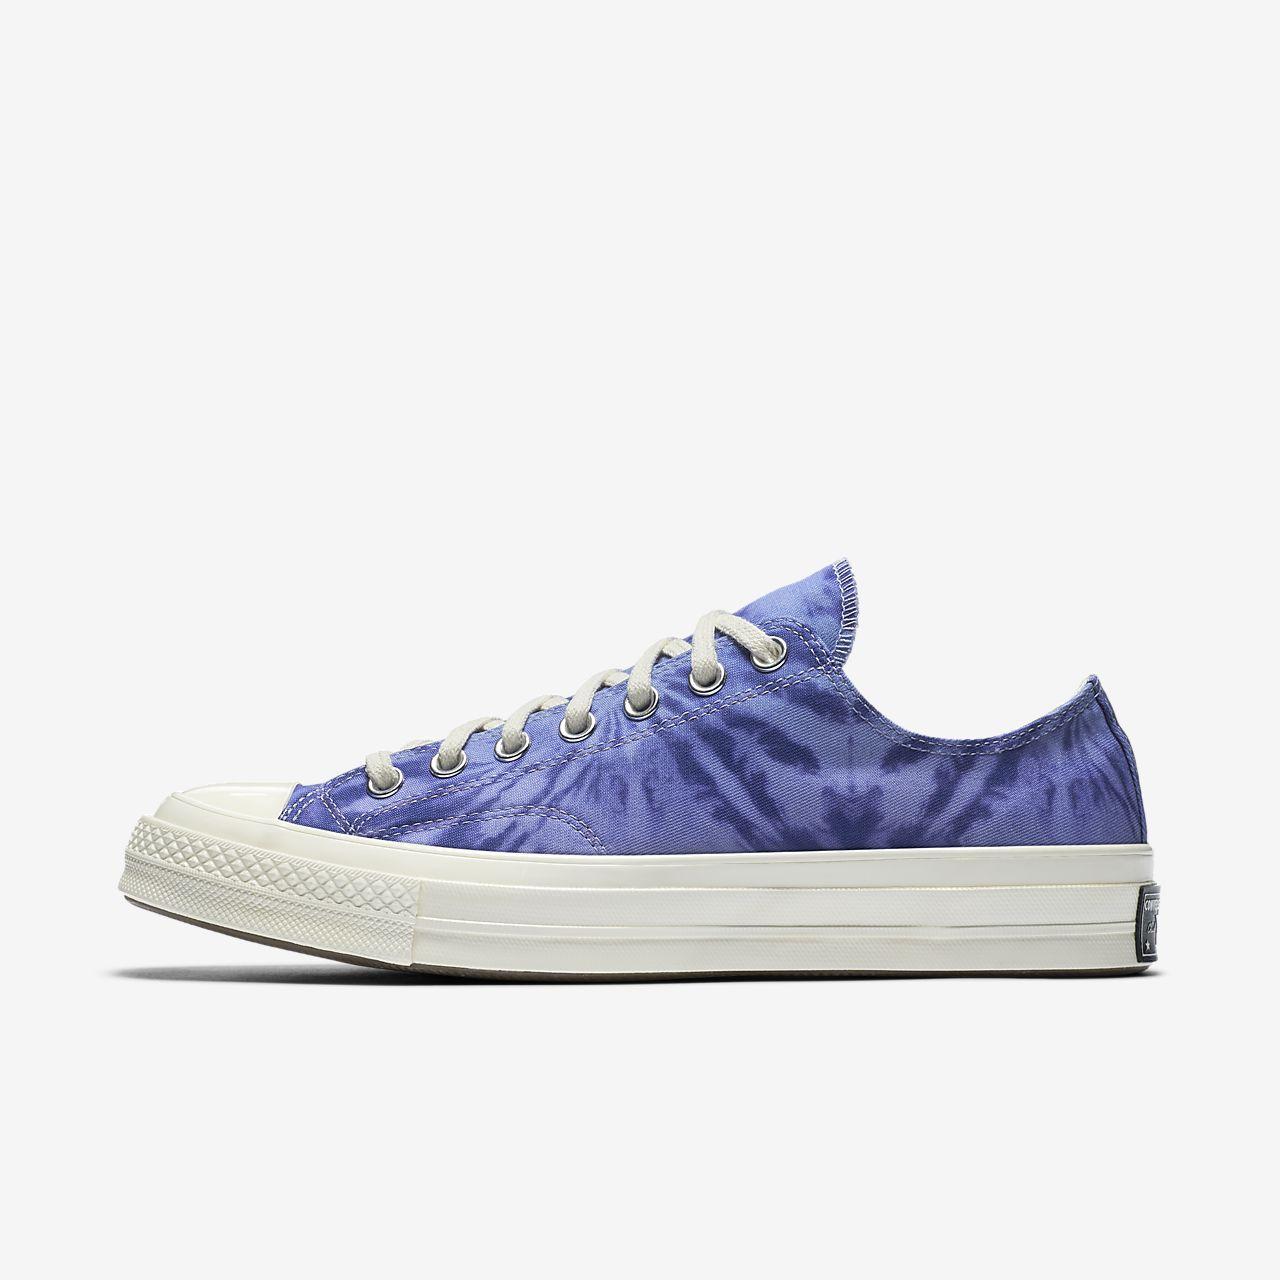 Converse Chuck 70 Tie Dye Low Top Unisex Shoe